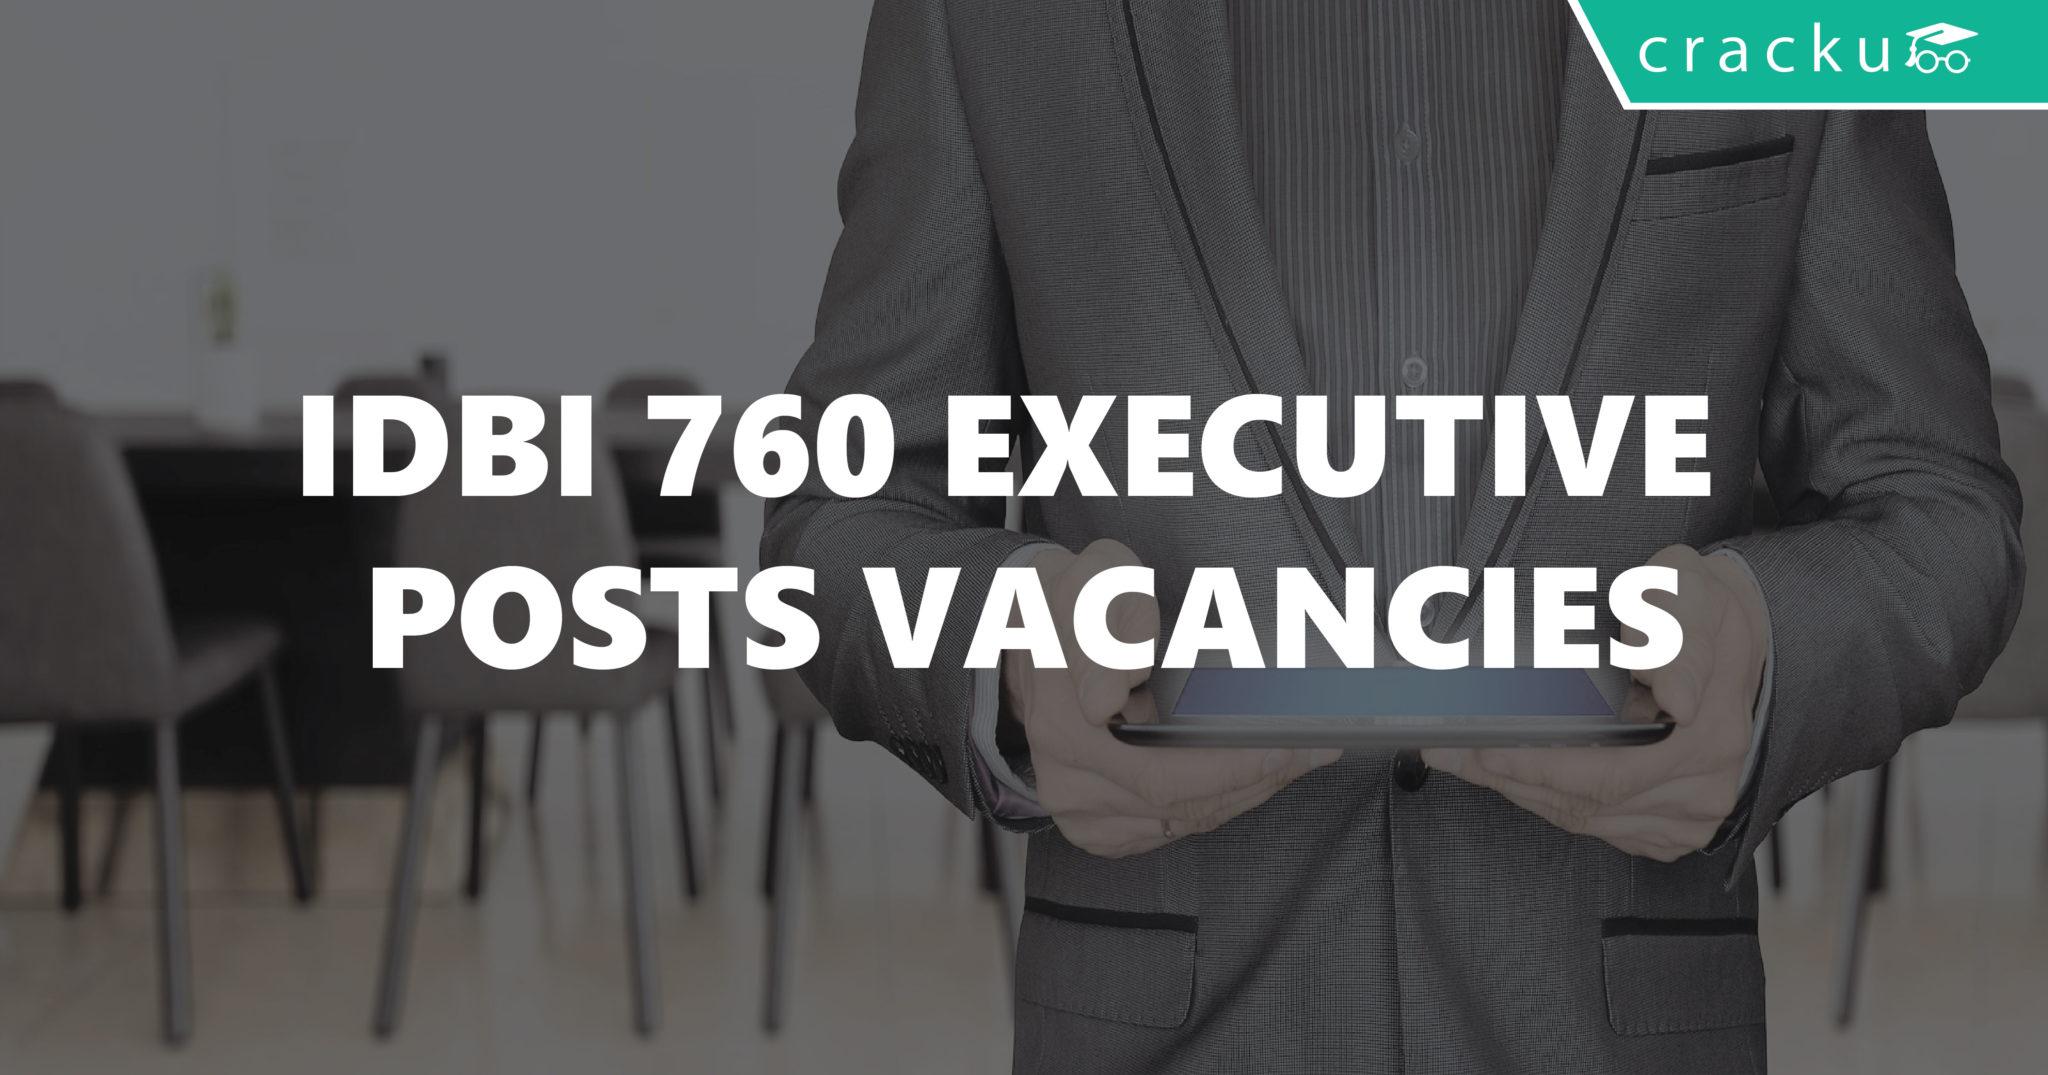 idbi 760 executive posts vacancies 01